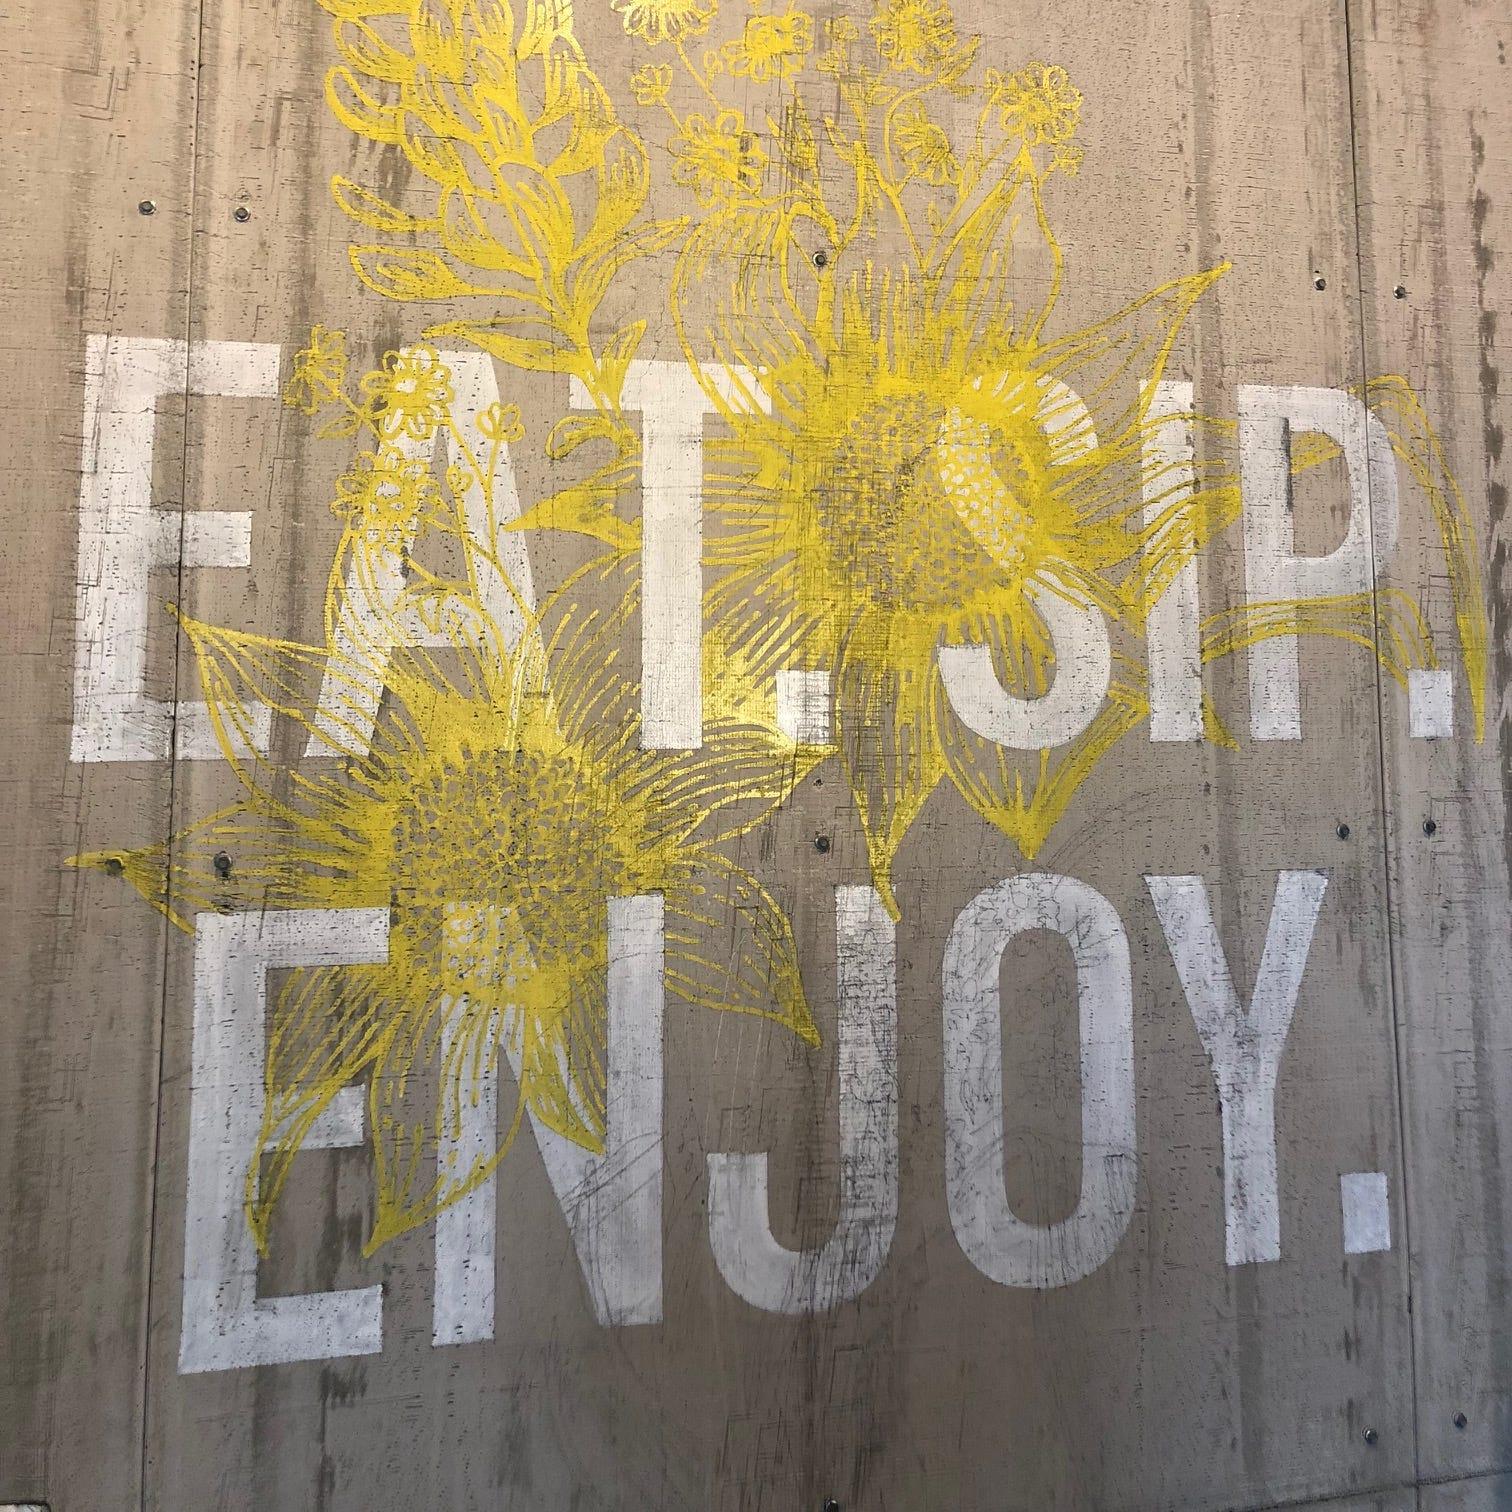 This 'Eat. Sip. Enjoy.' illustration is displayed inside Wildflower in Phoenix.